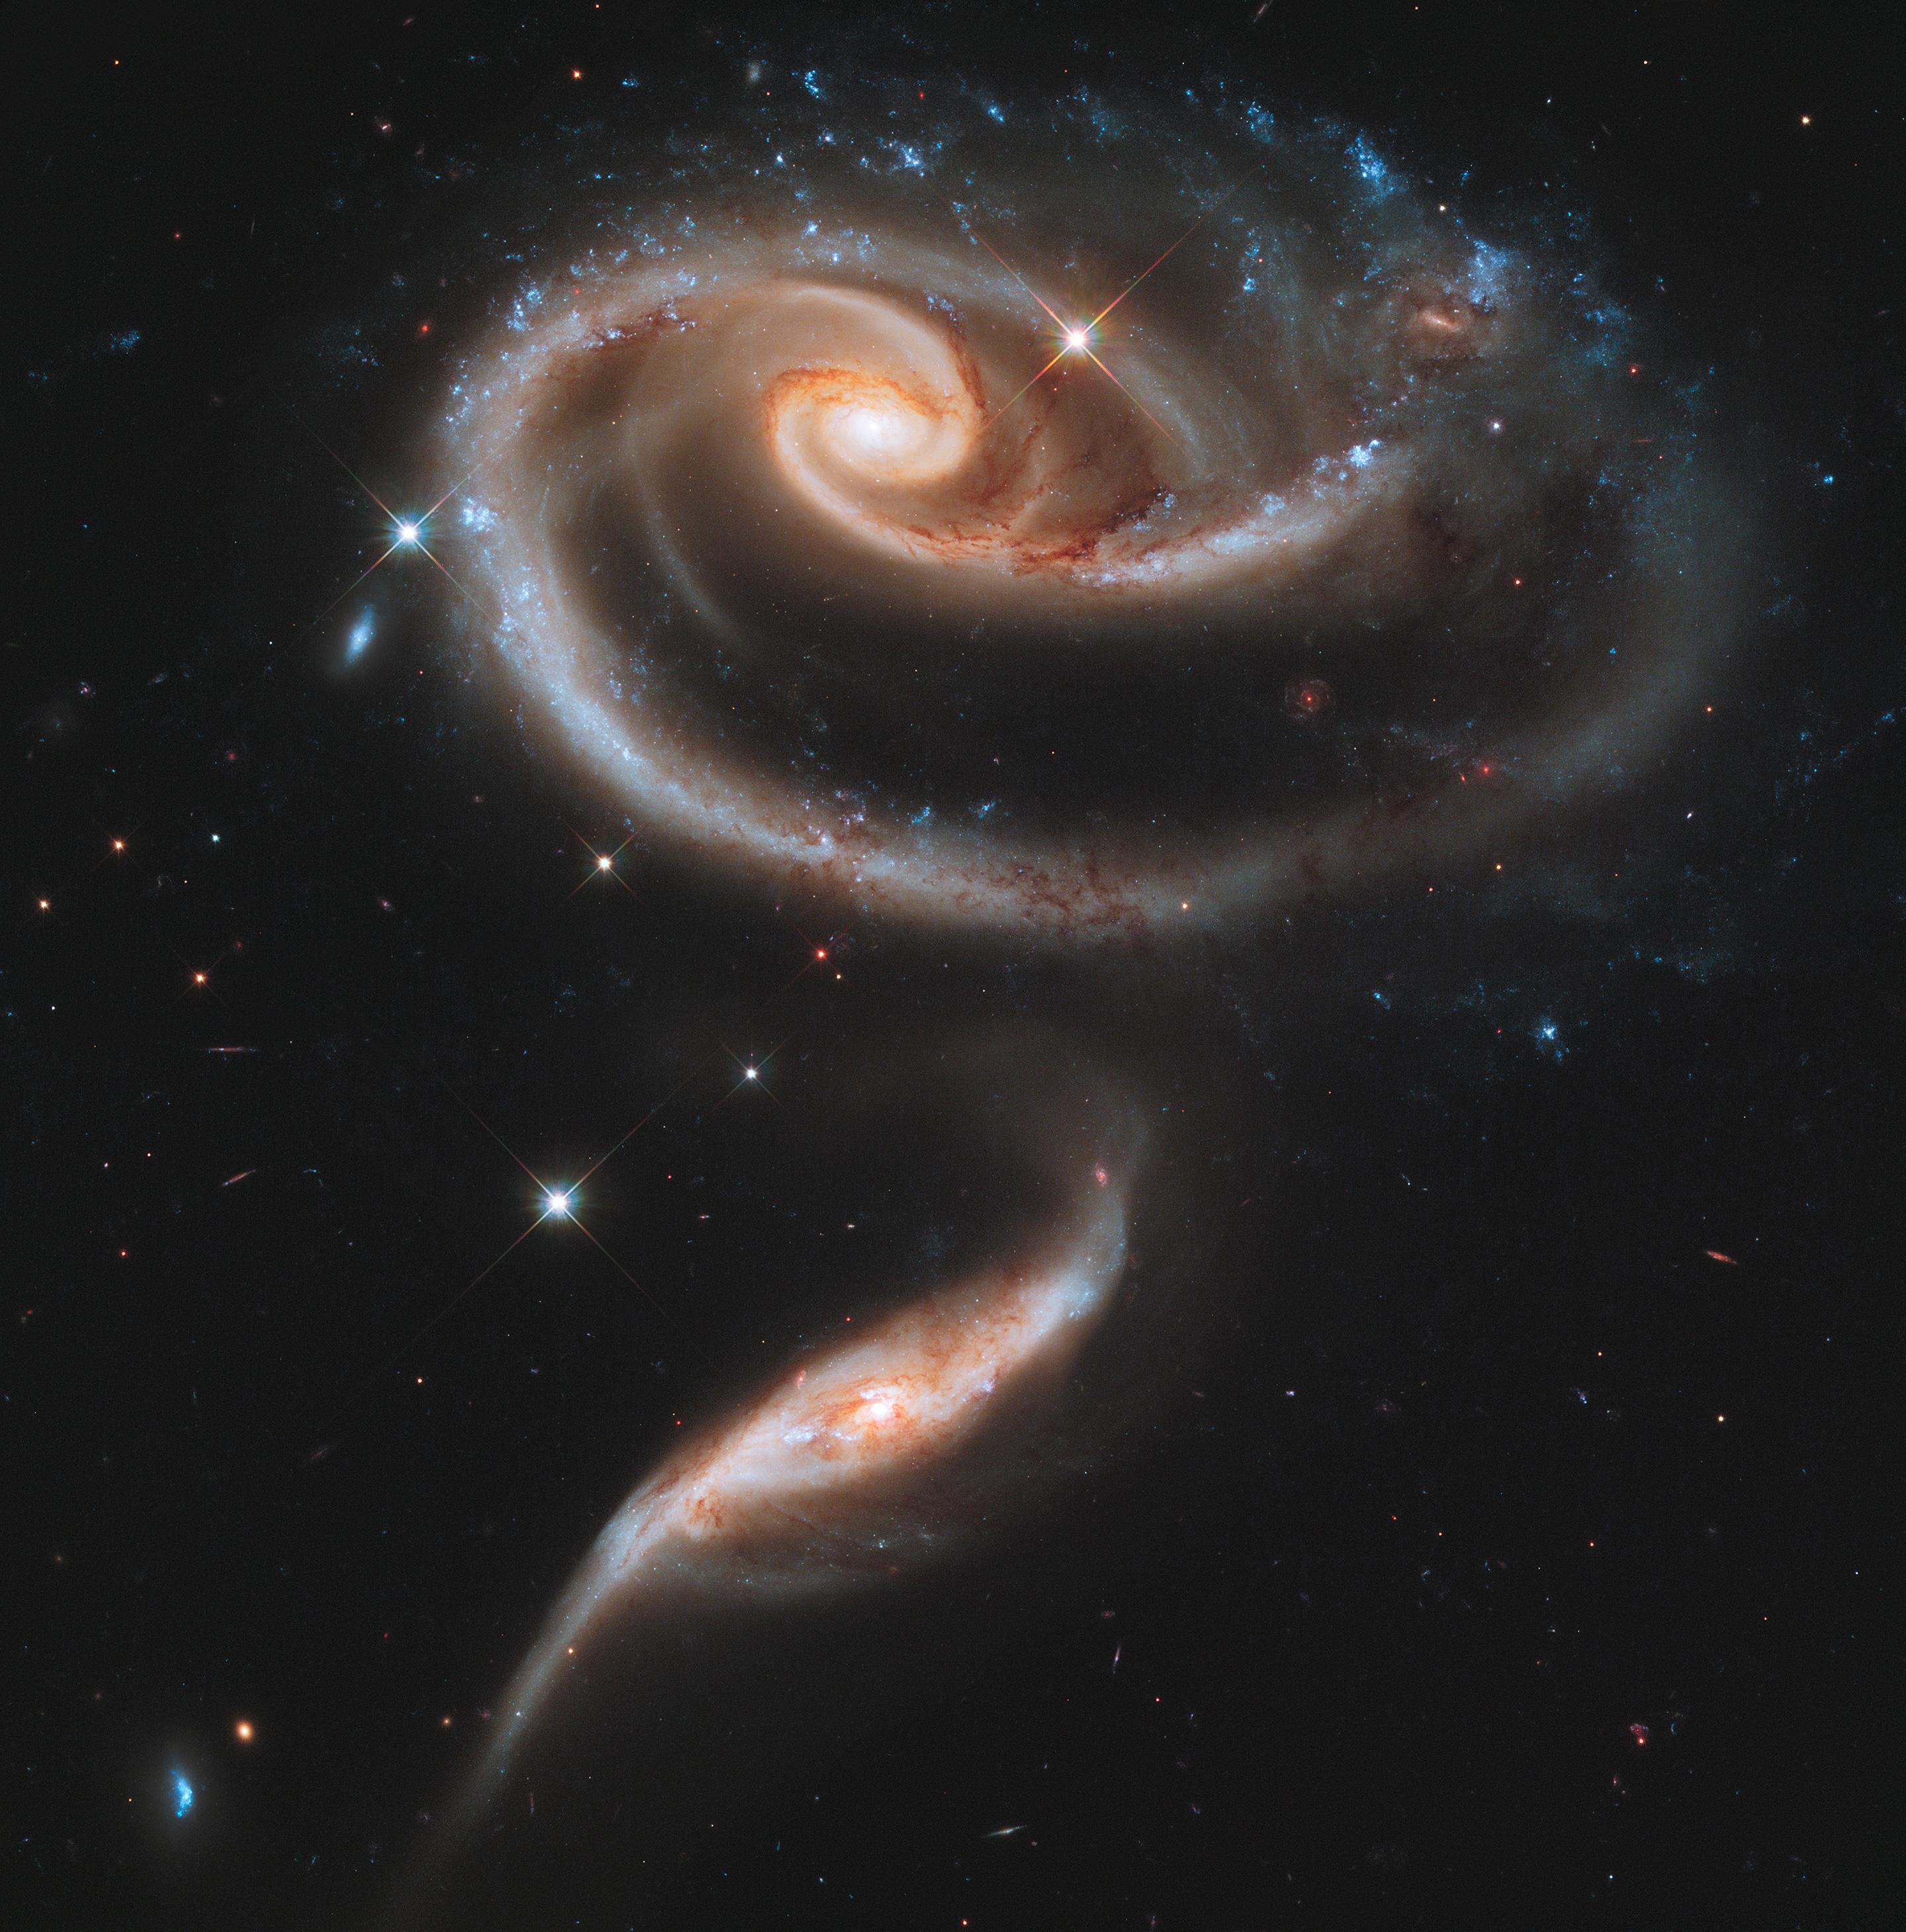 Hubble-hs-2011-11-a-full